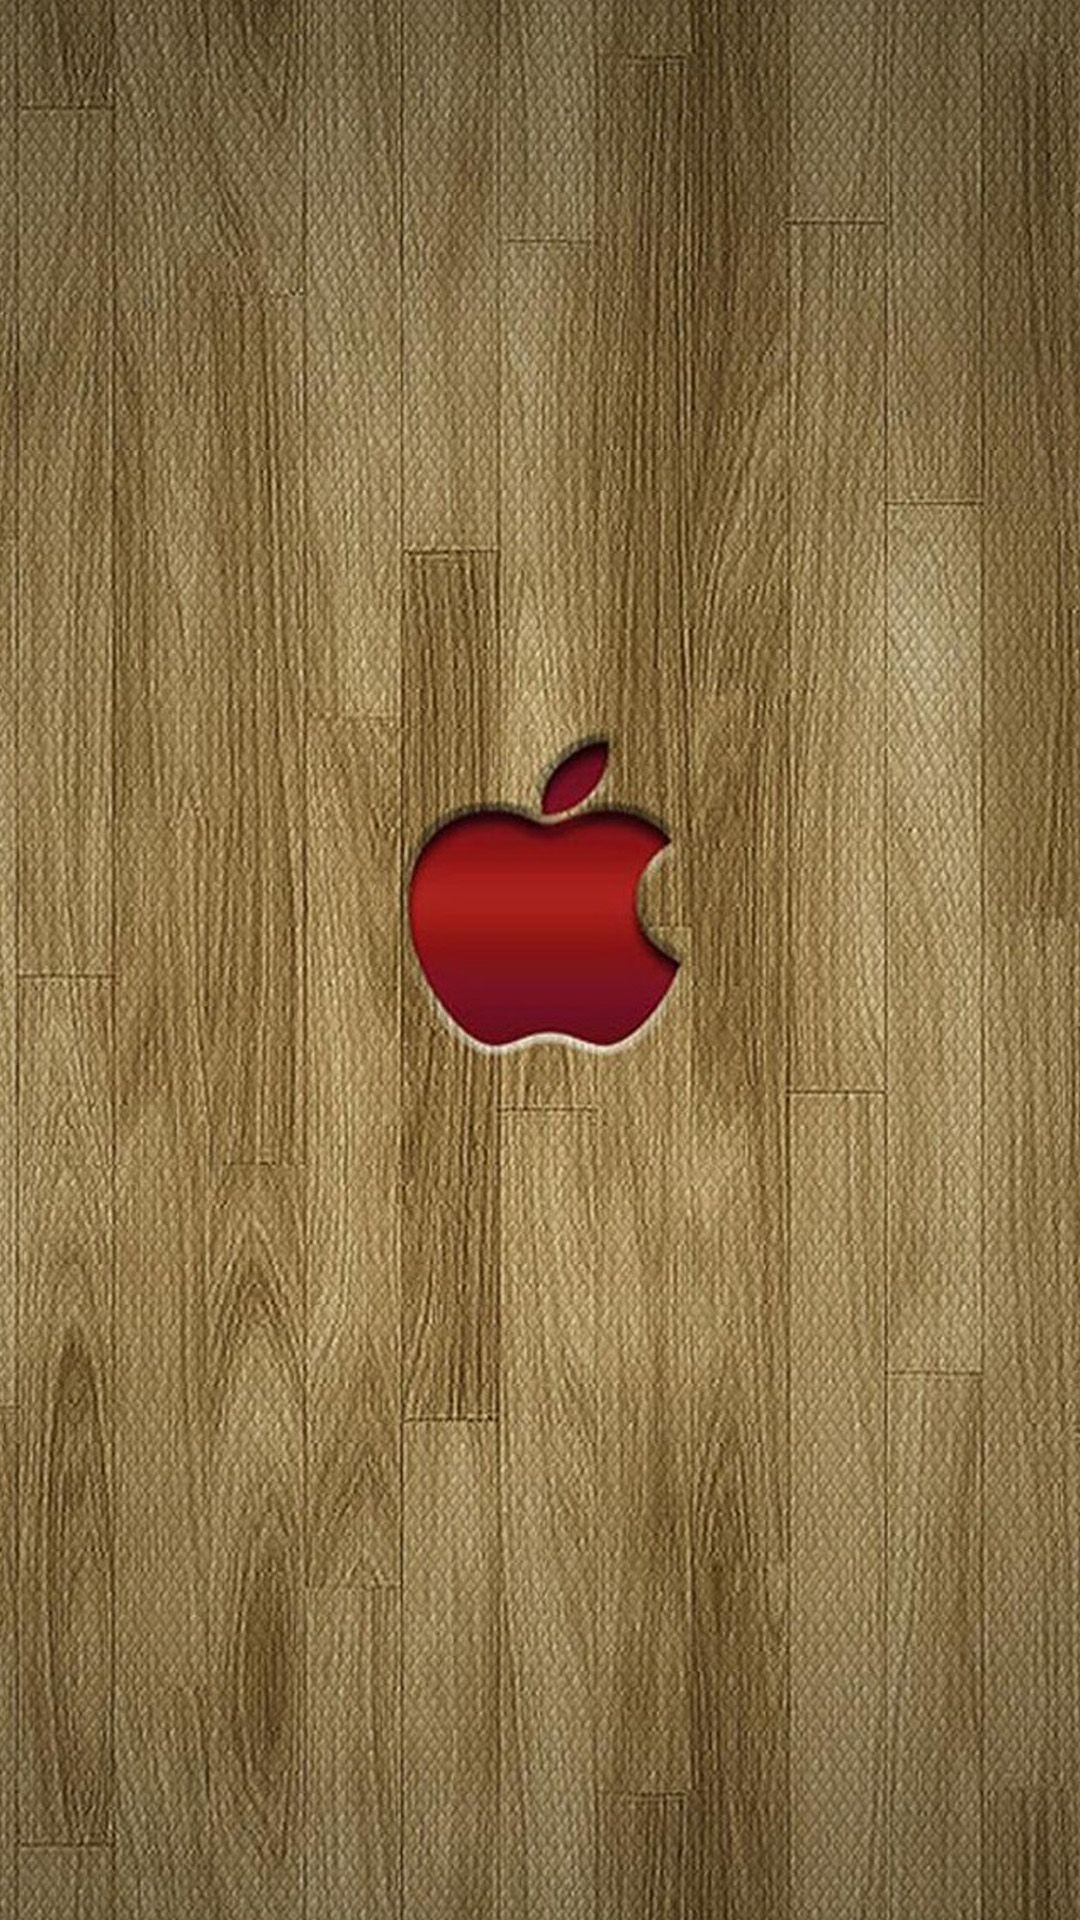 Apple logo wood texture apple wallpaper iphone apple